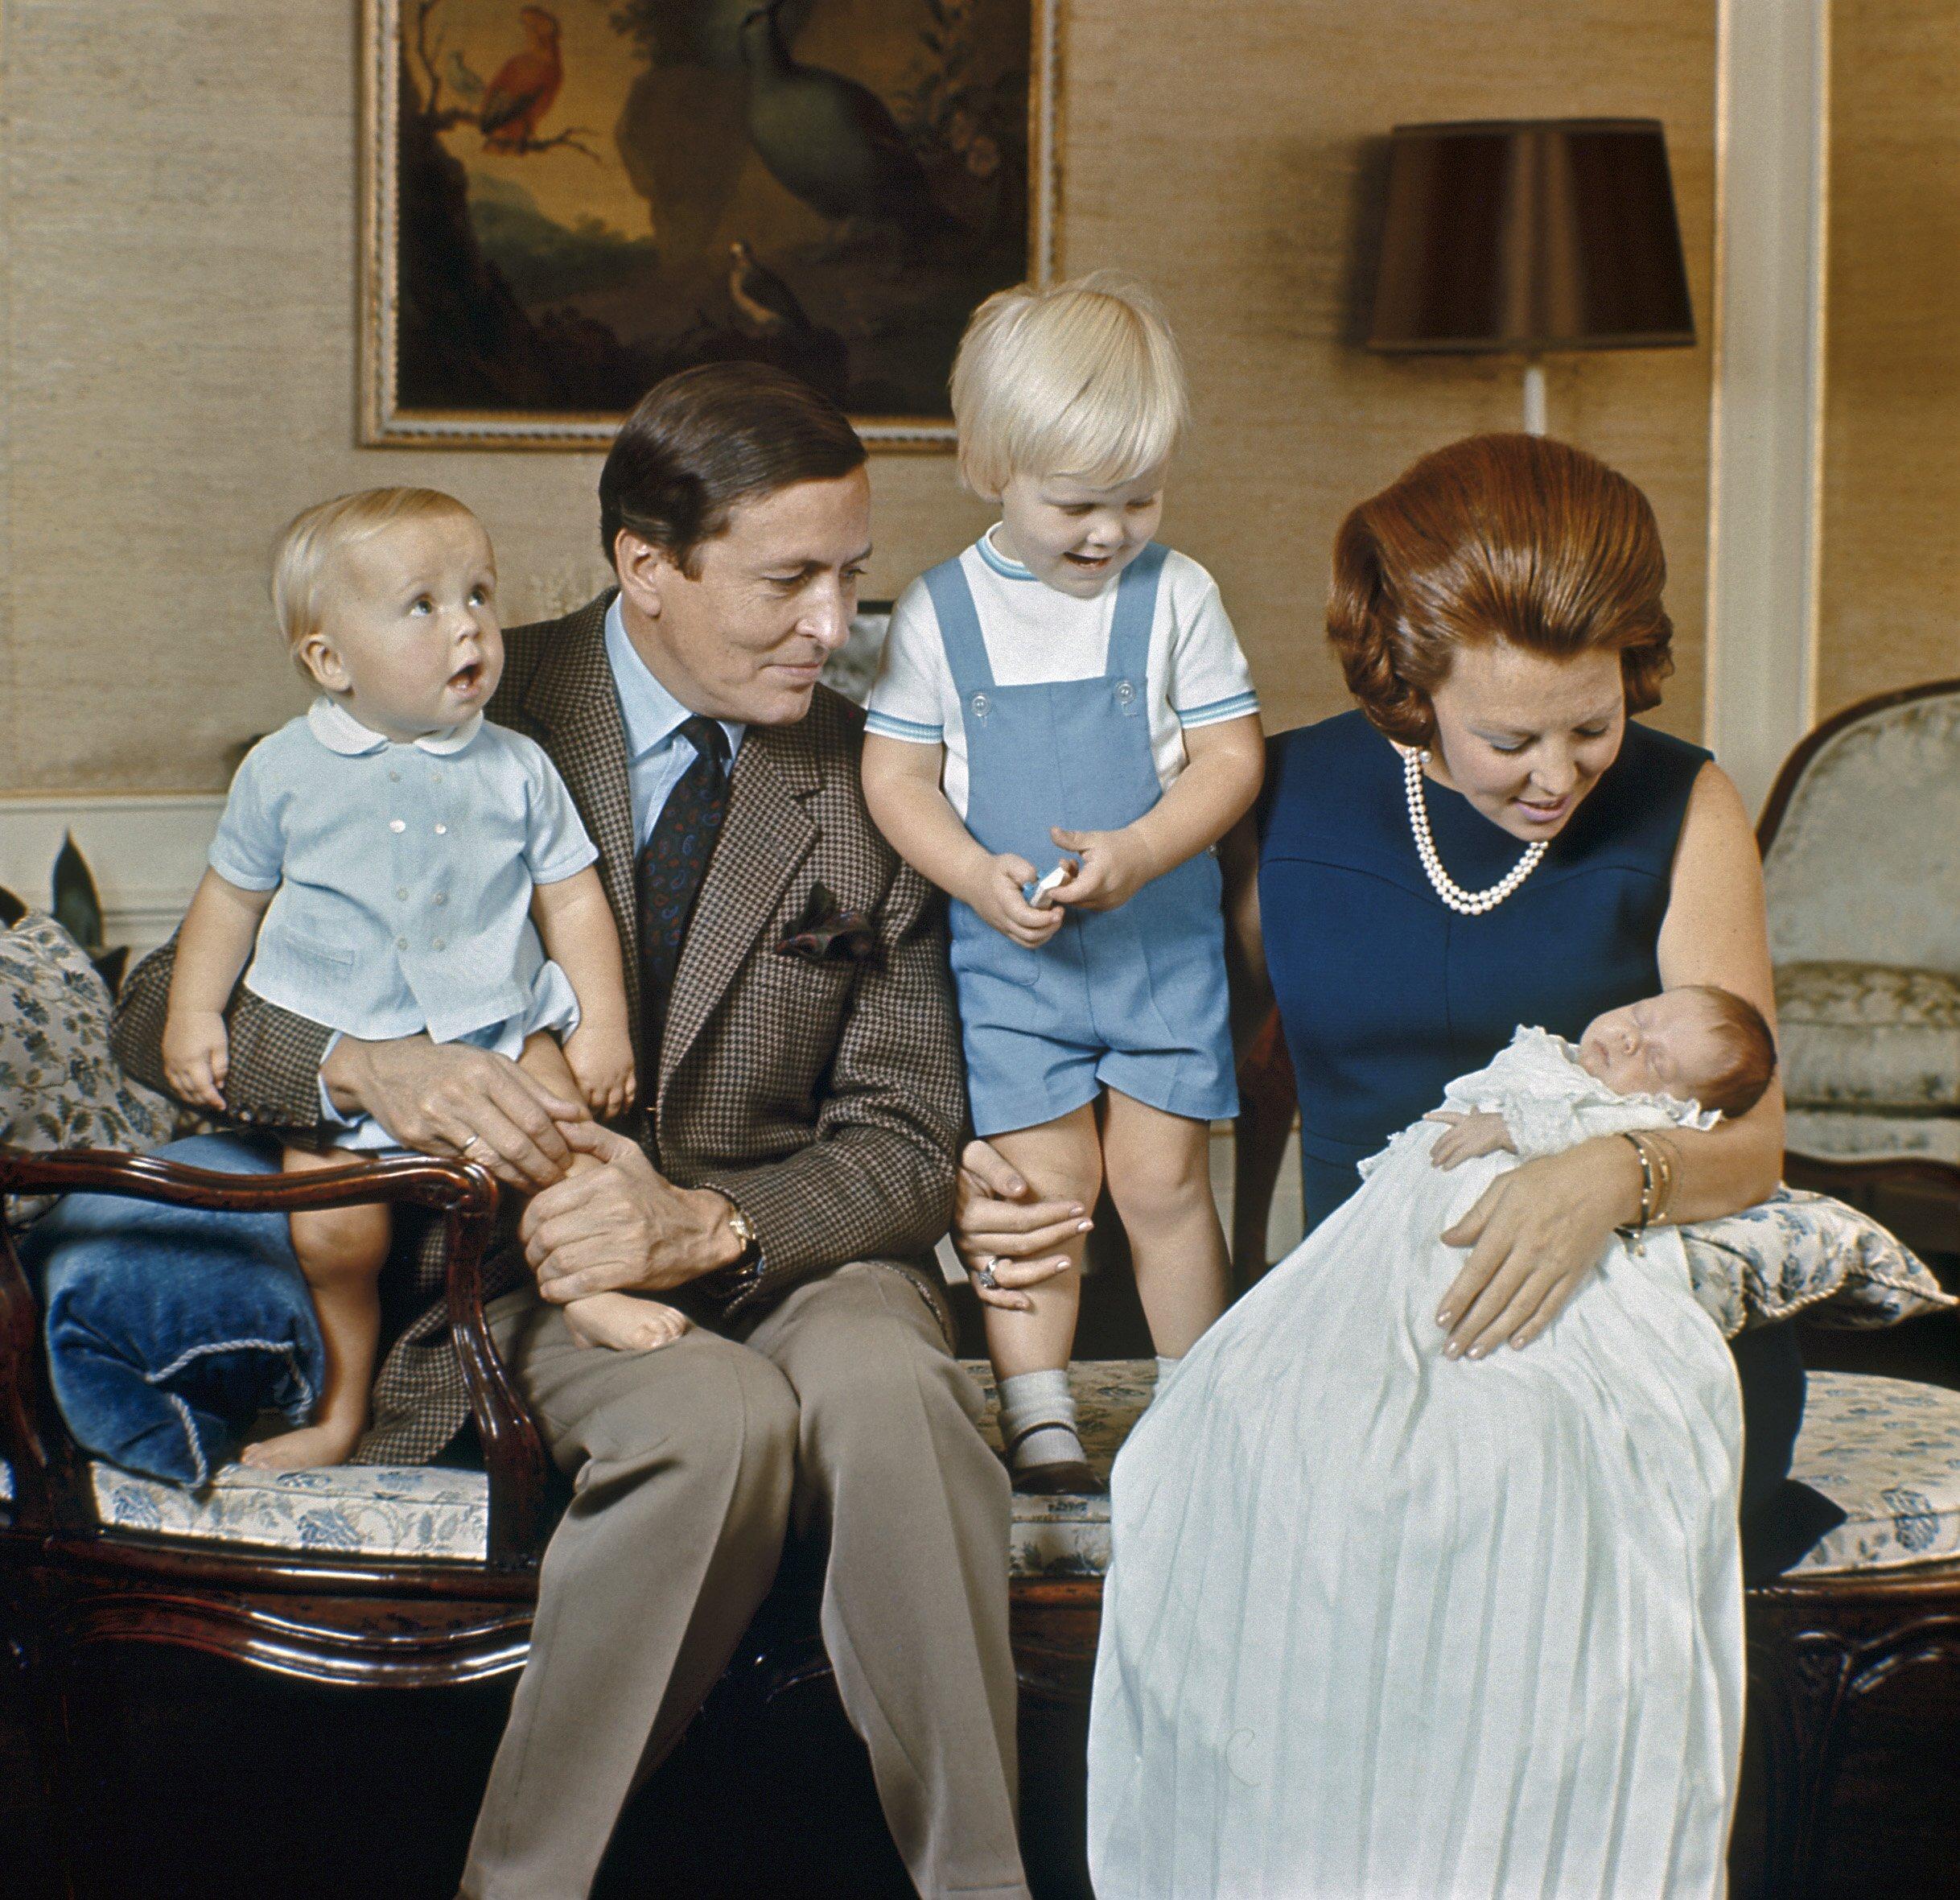 koningin 80 jaar momenten